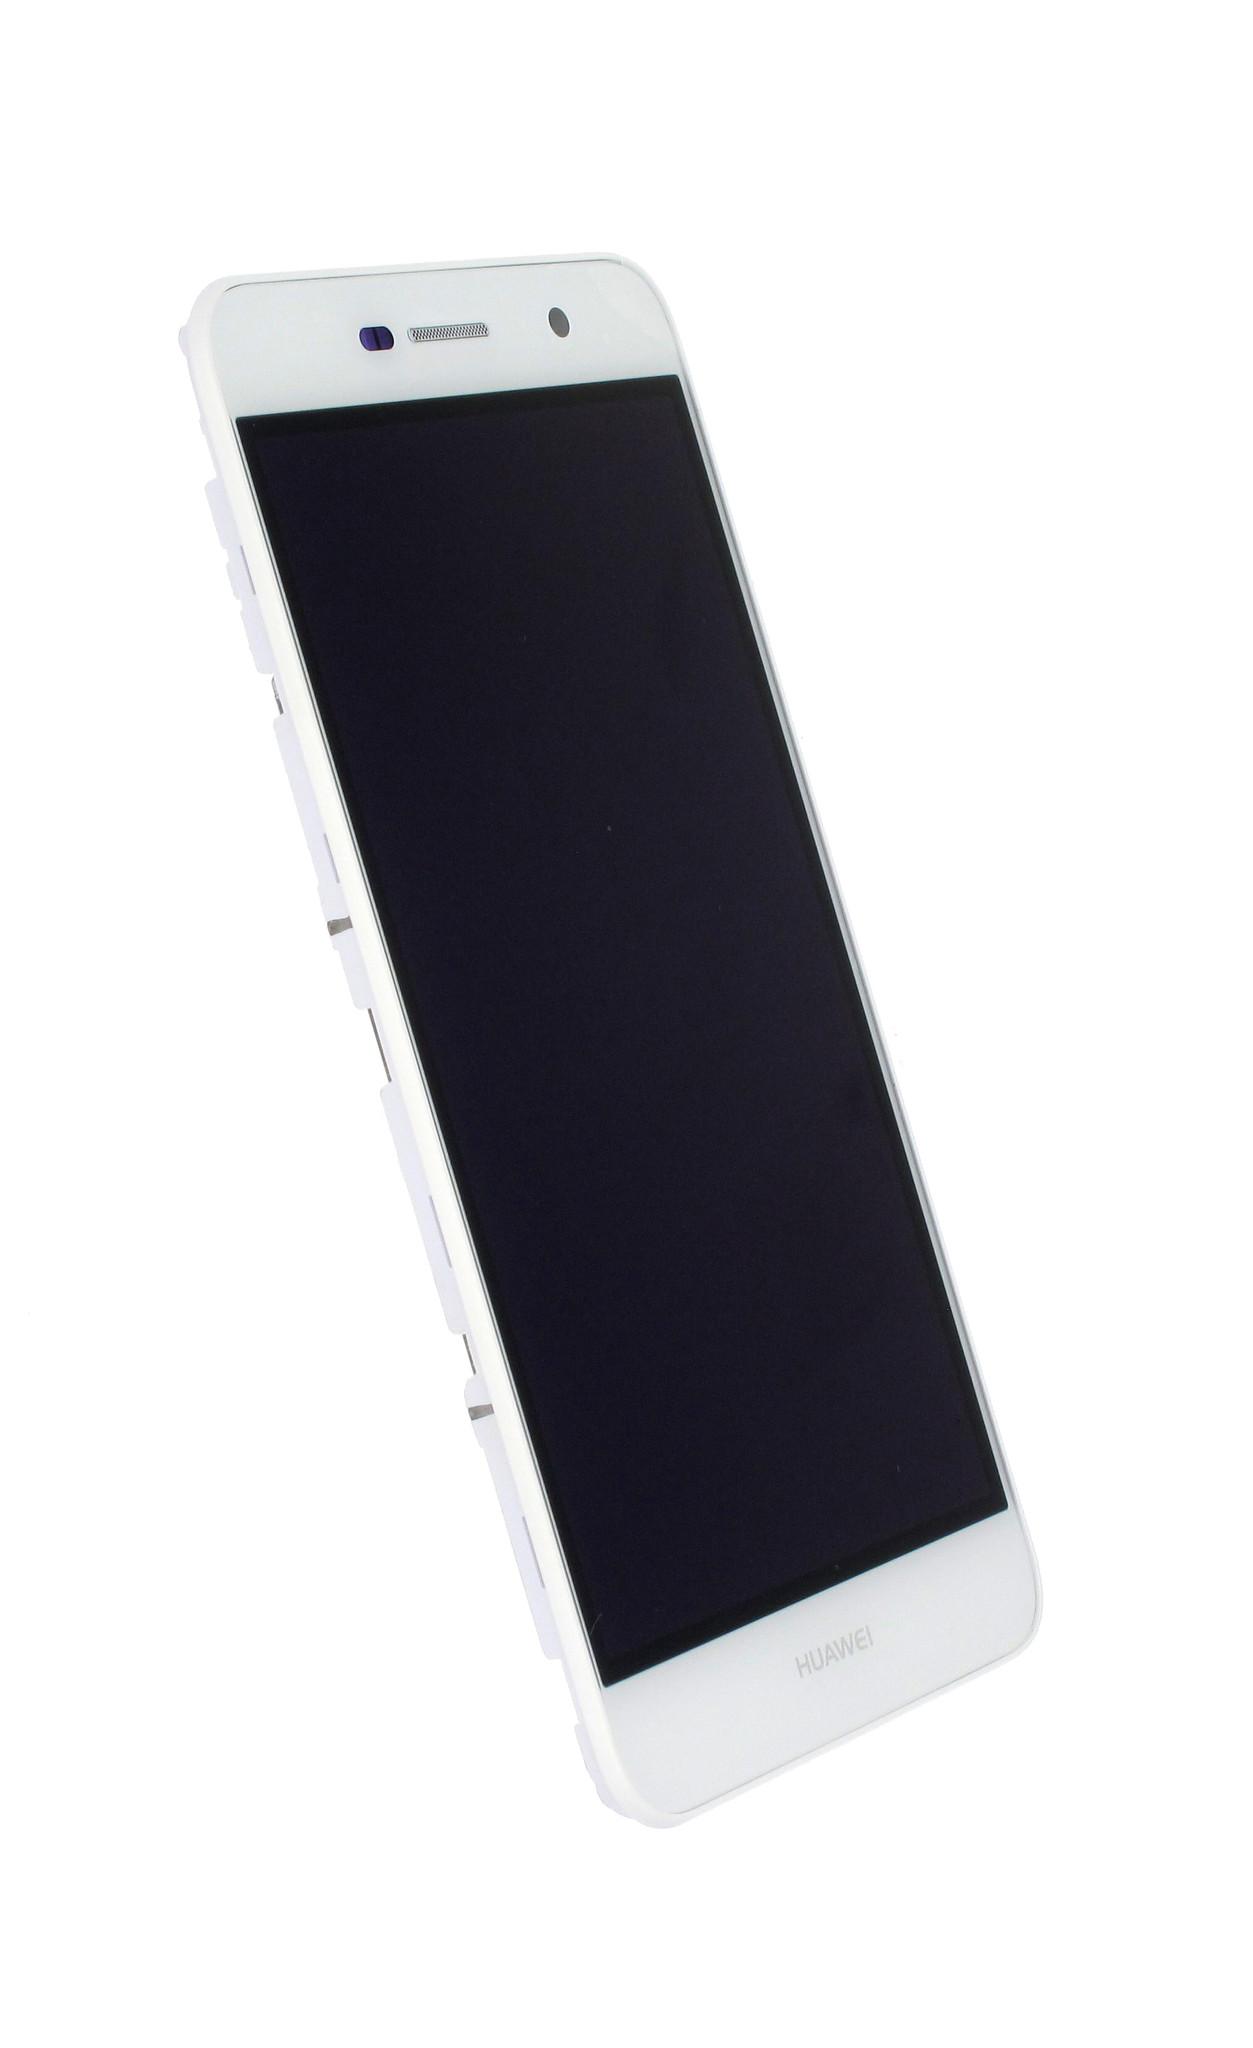 Huawei Y6 Pro 4G (TIT-AL00) LCD Display Module, White, 97070MDU